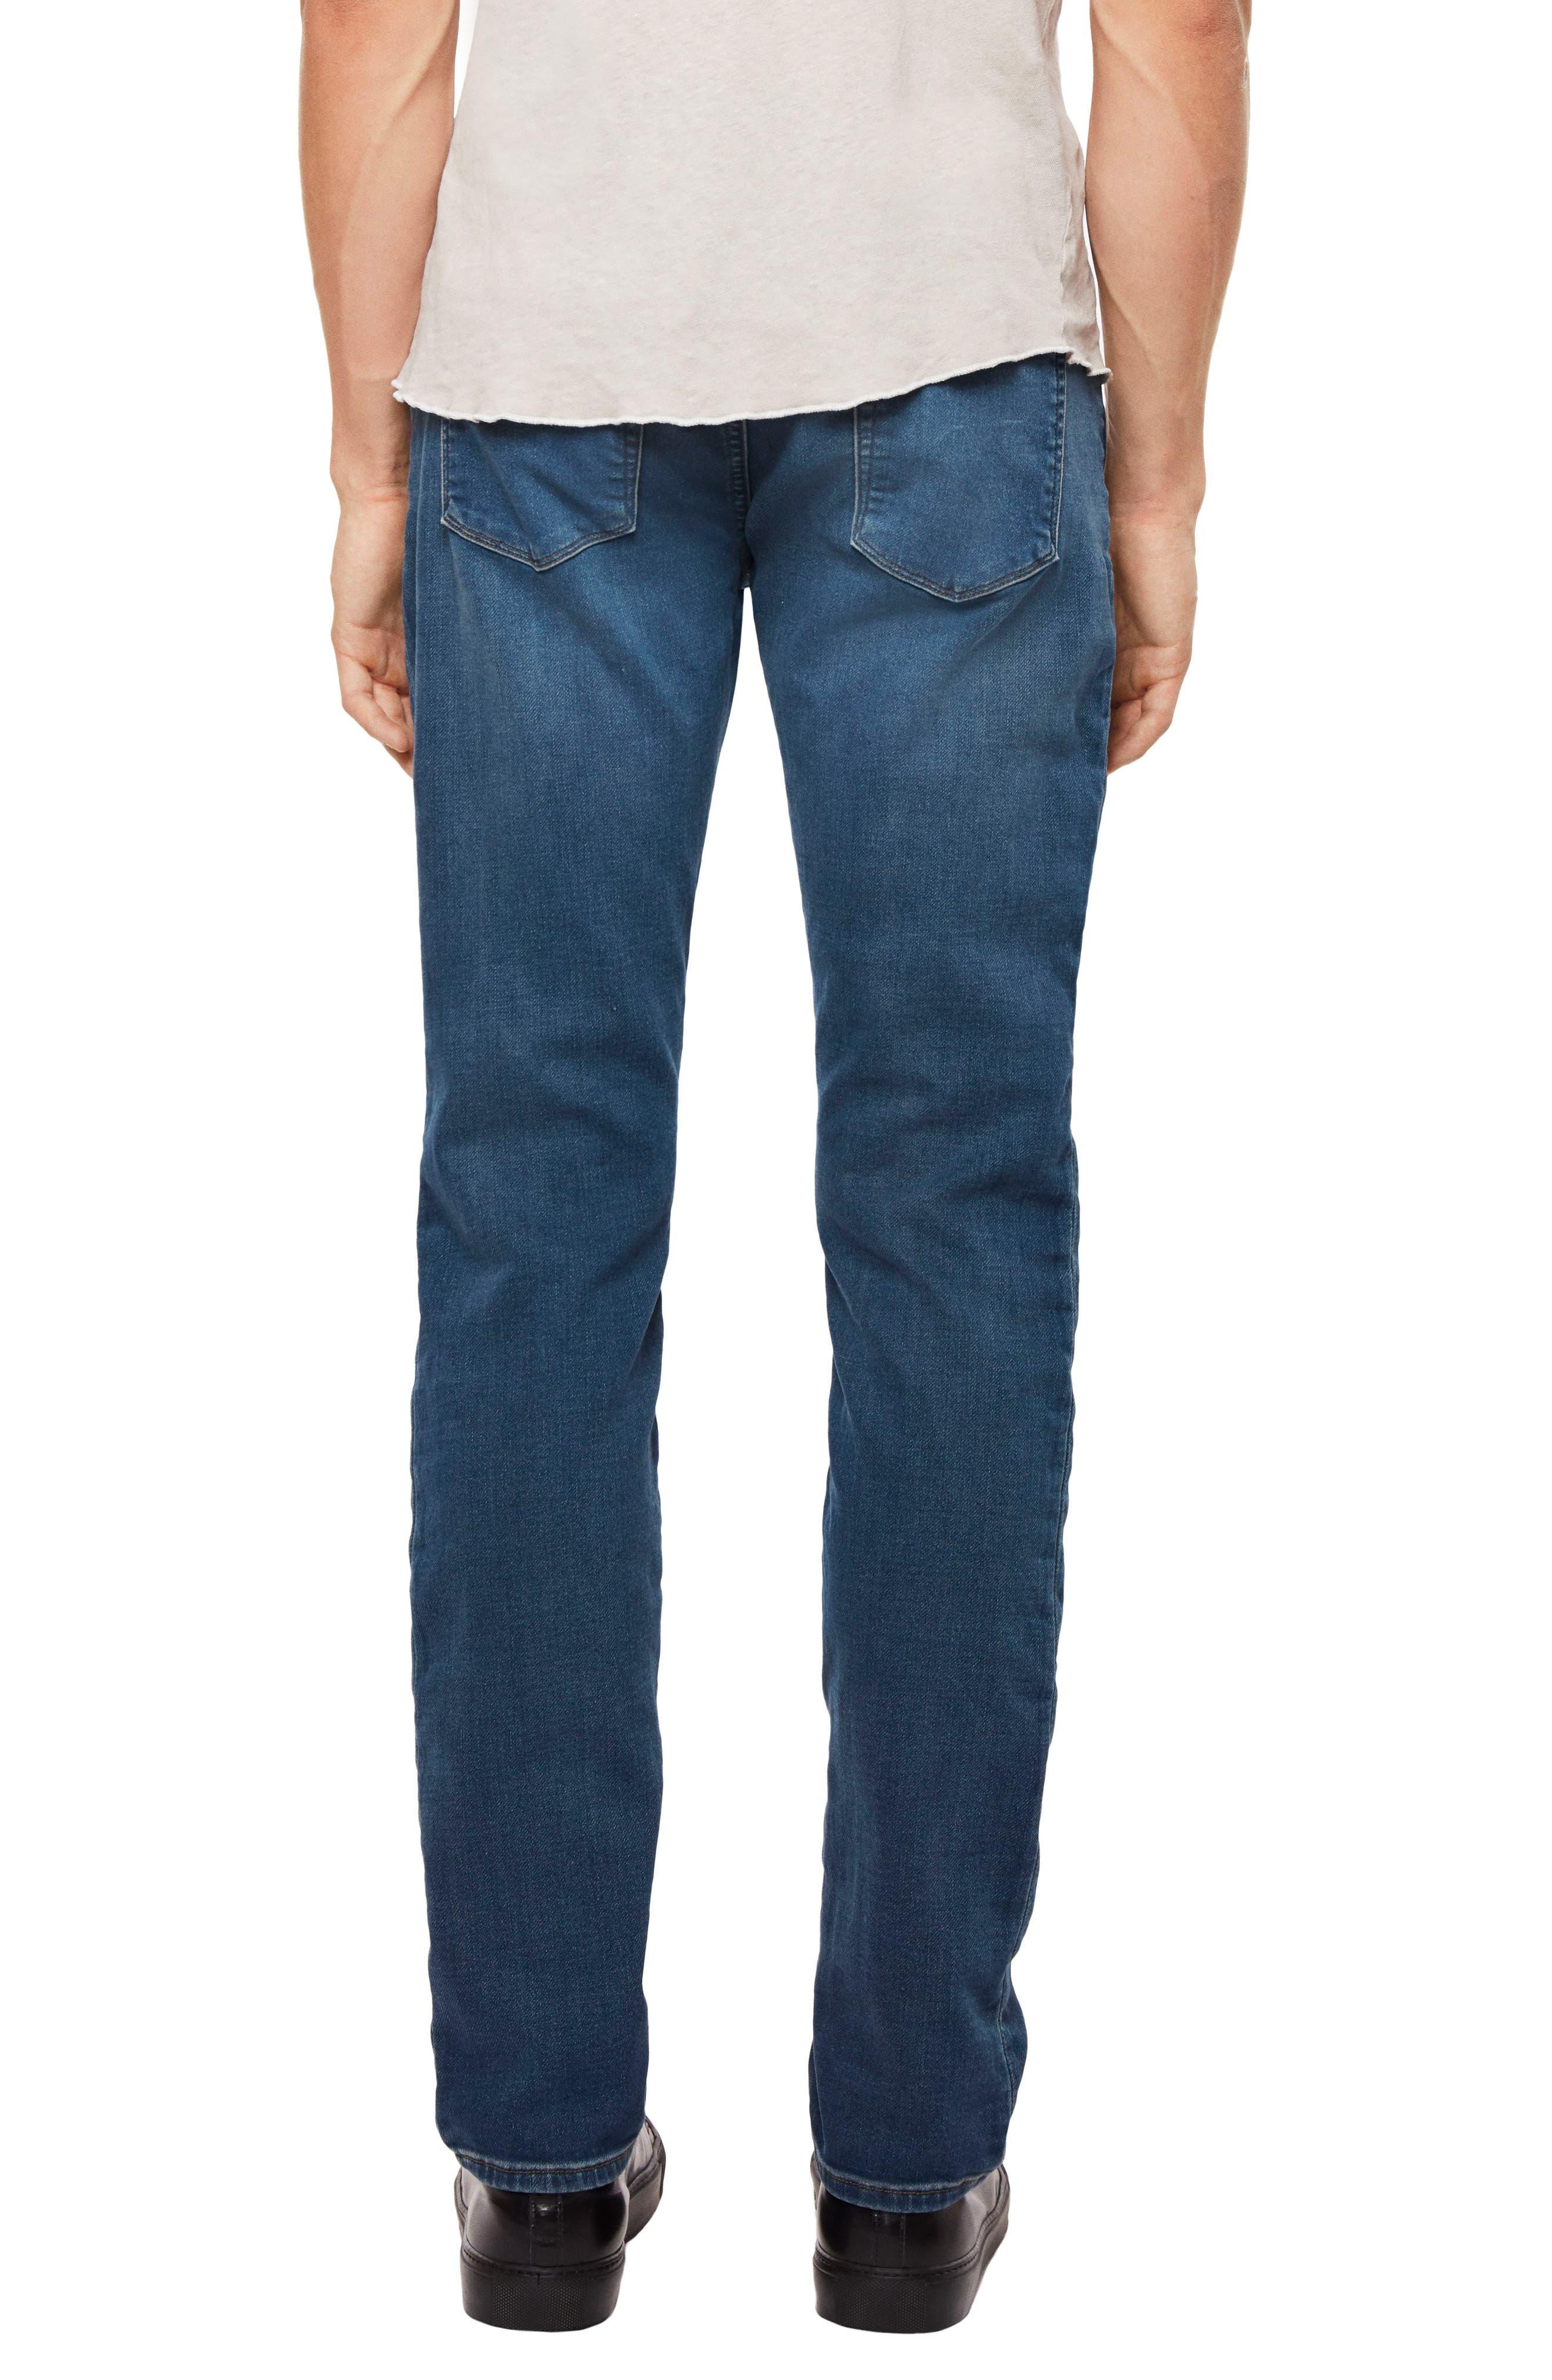 Kane Slim Straight Leg Jeans,                             Alternate thumbnail 2, color,                             Landform